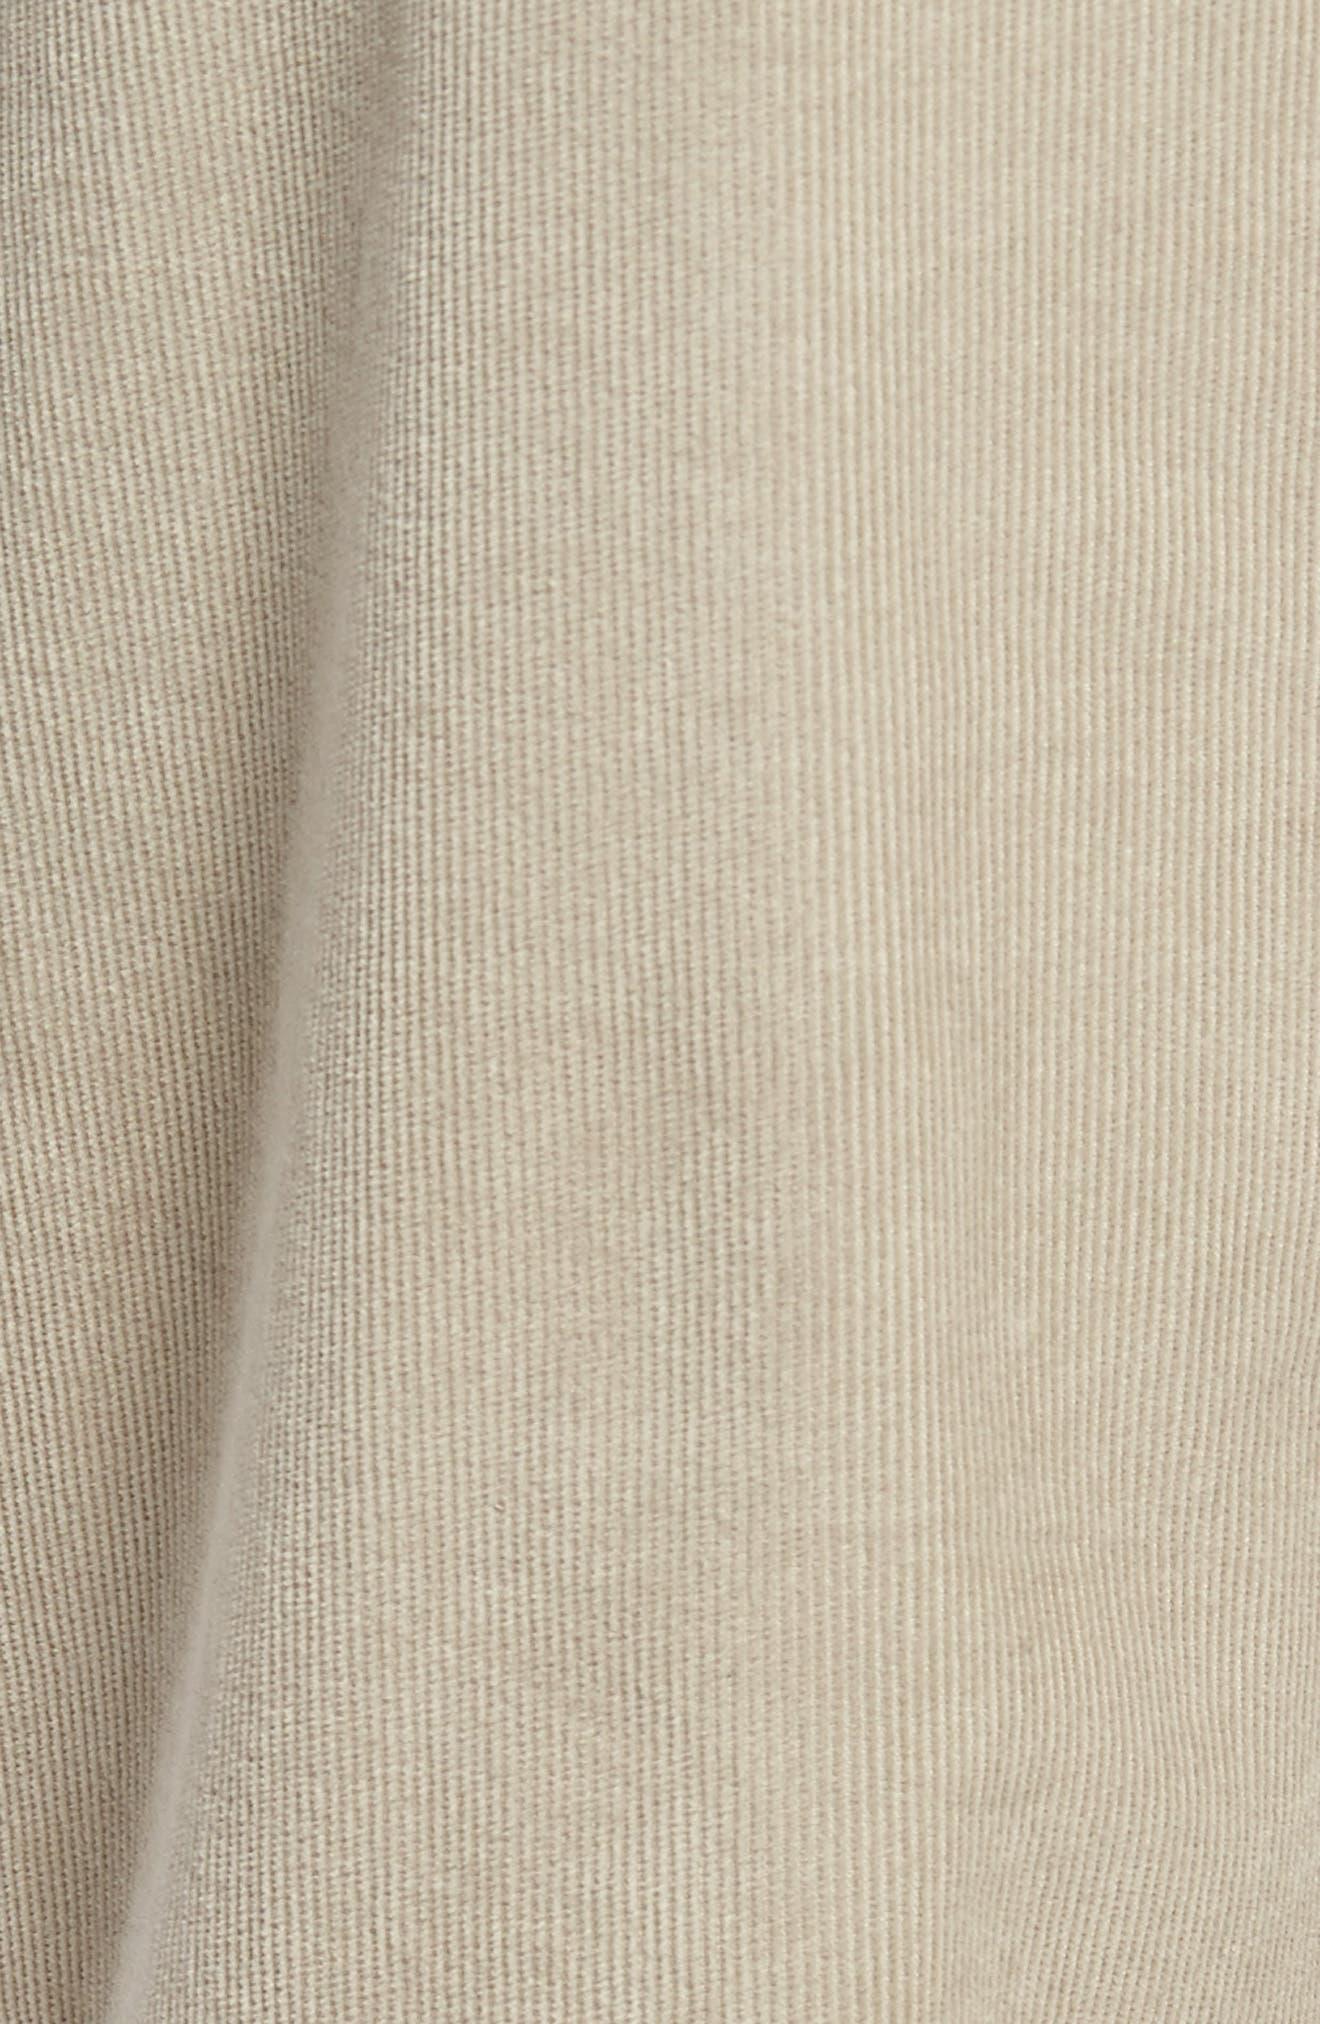 Redonda Stretch Corduroy Trousers,                             Alternate thumbnail 5, color,                             252